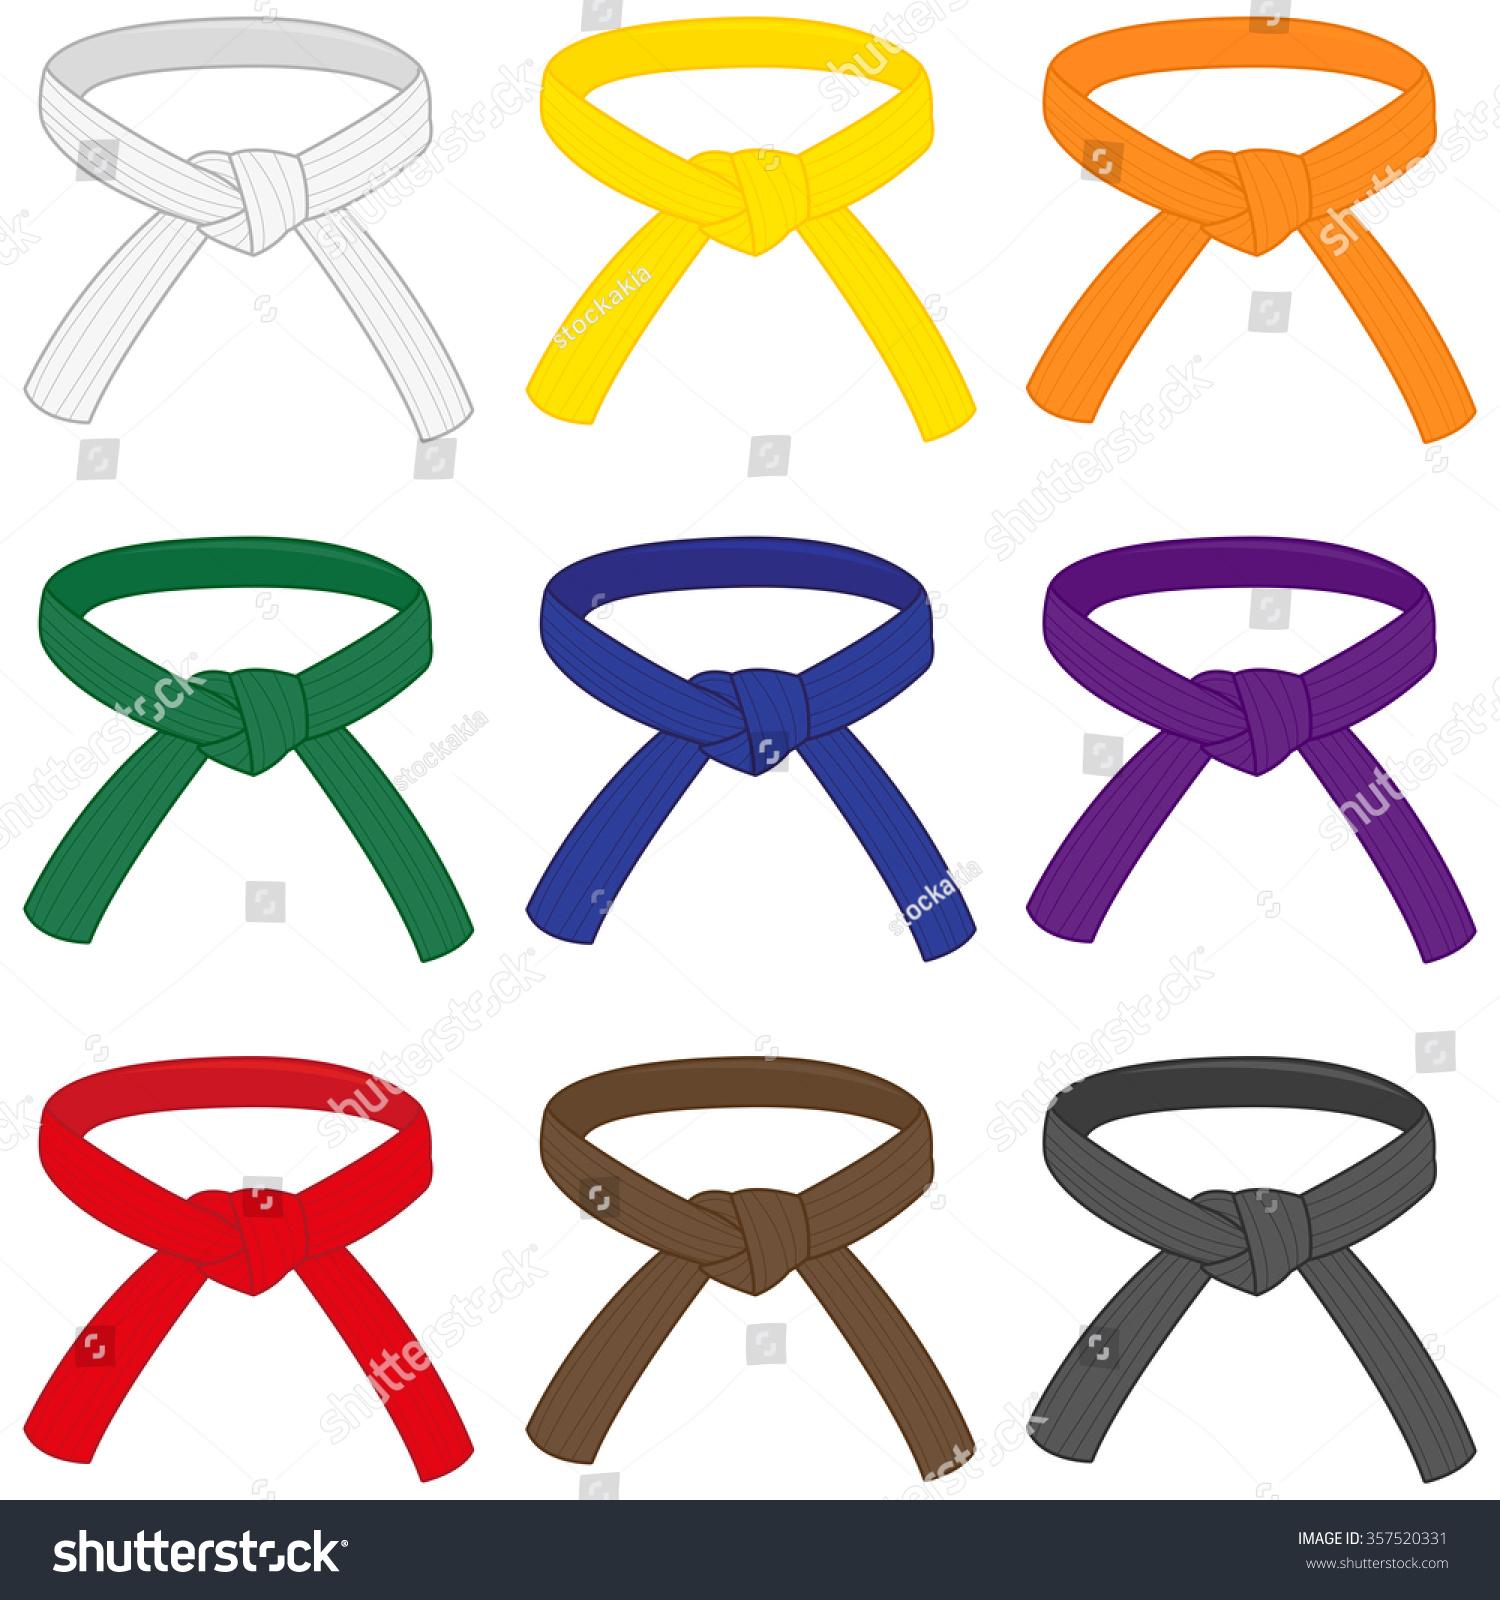 yellow belt clipart - photo #49